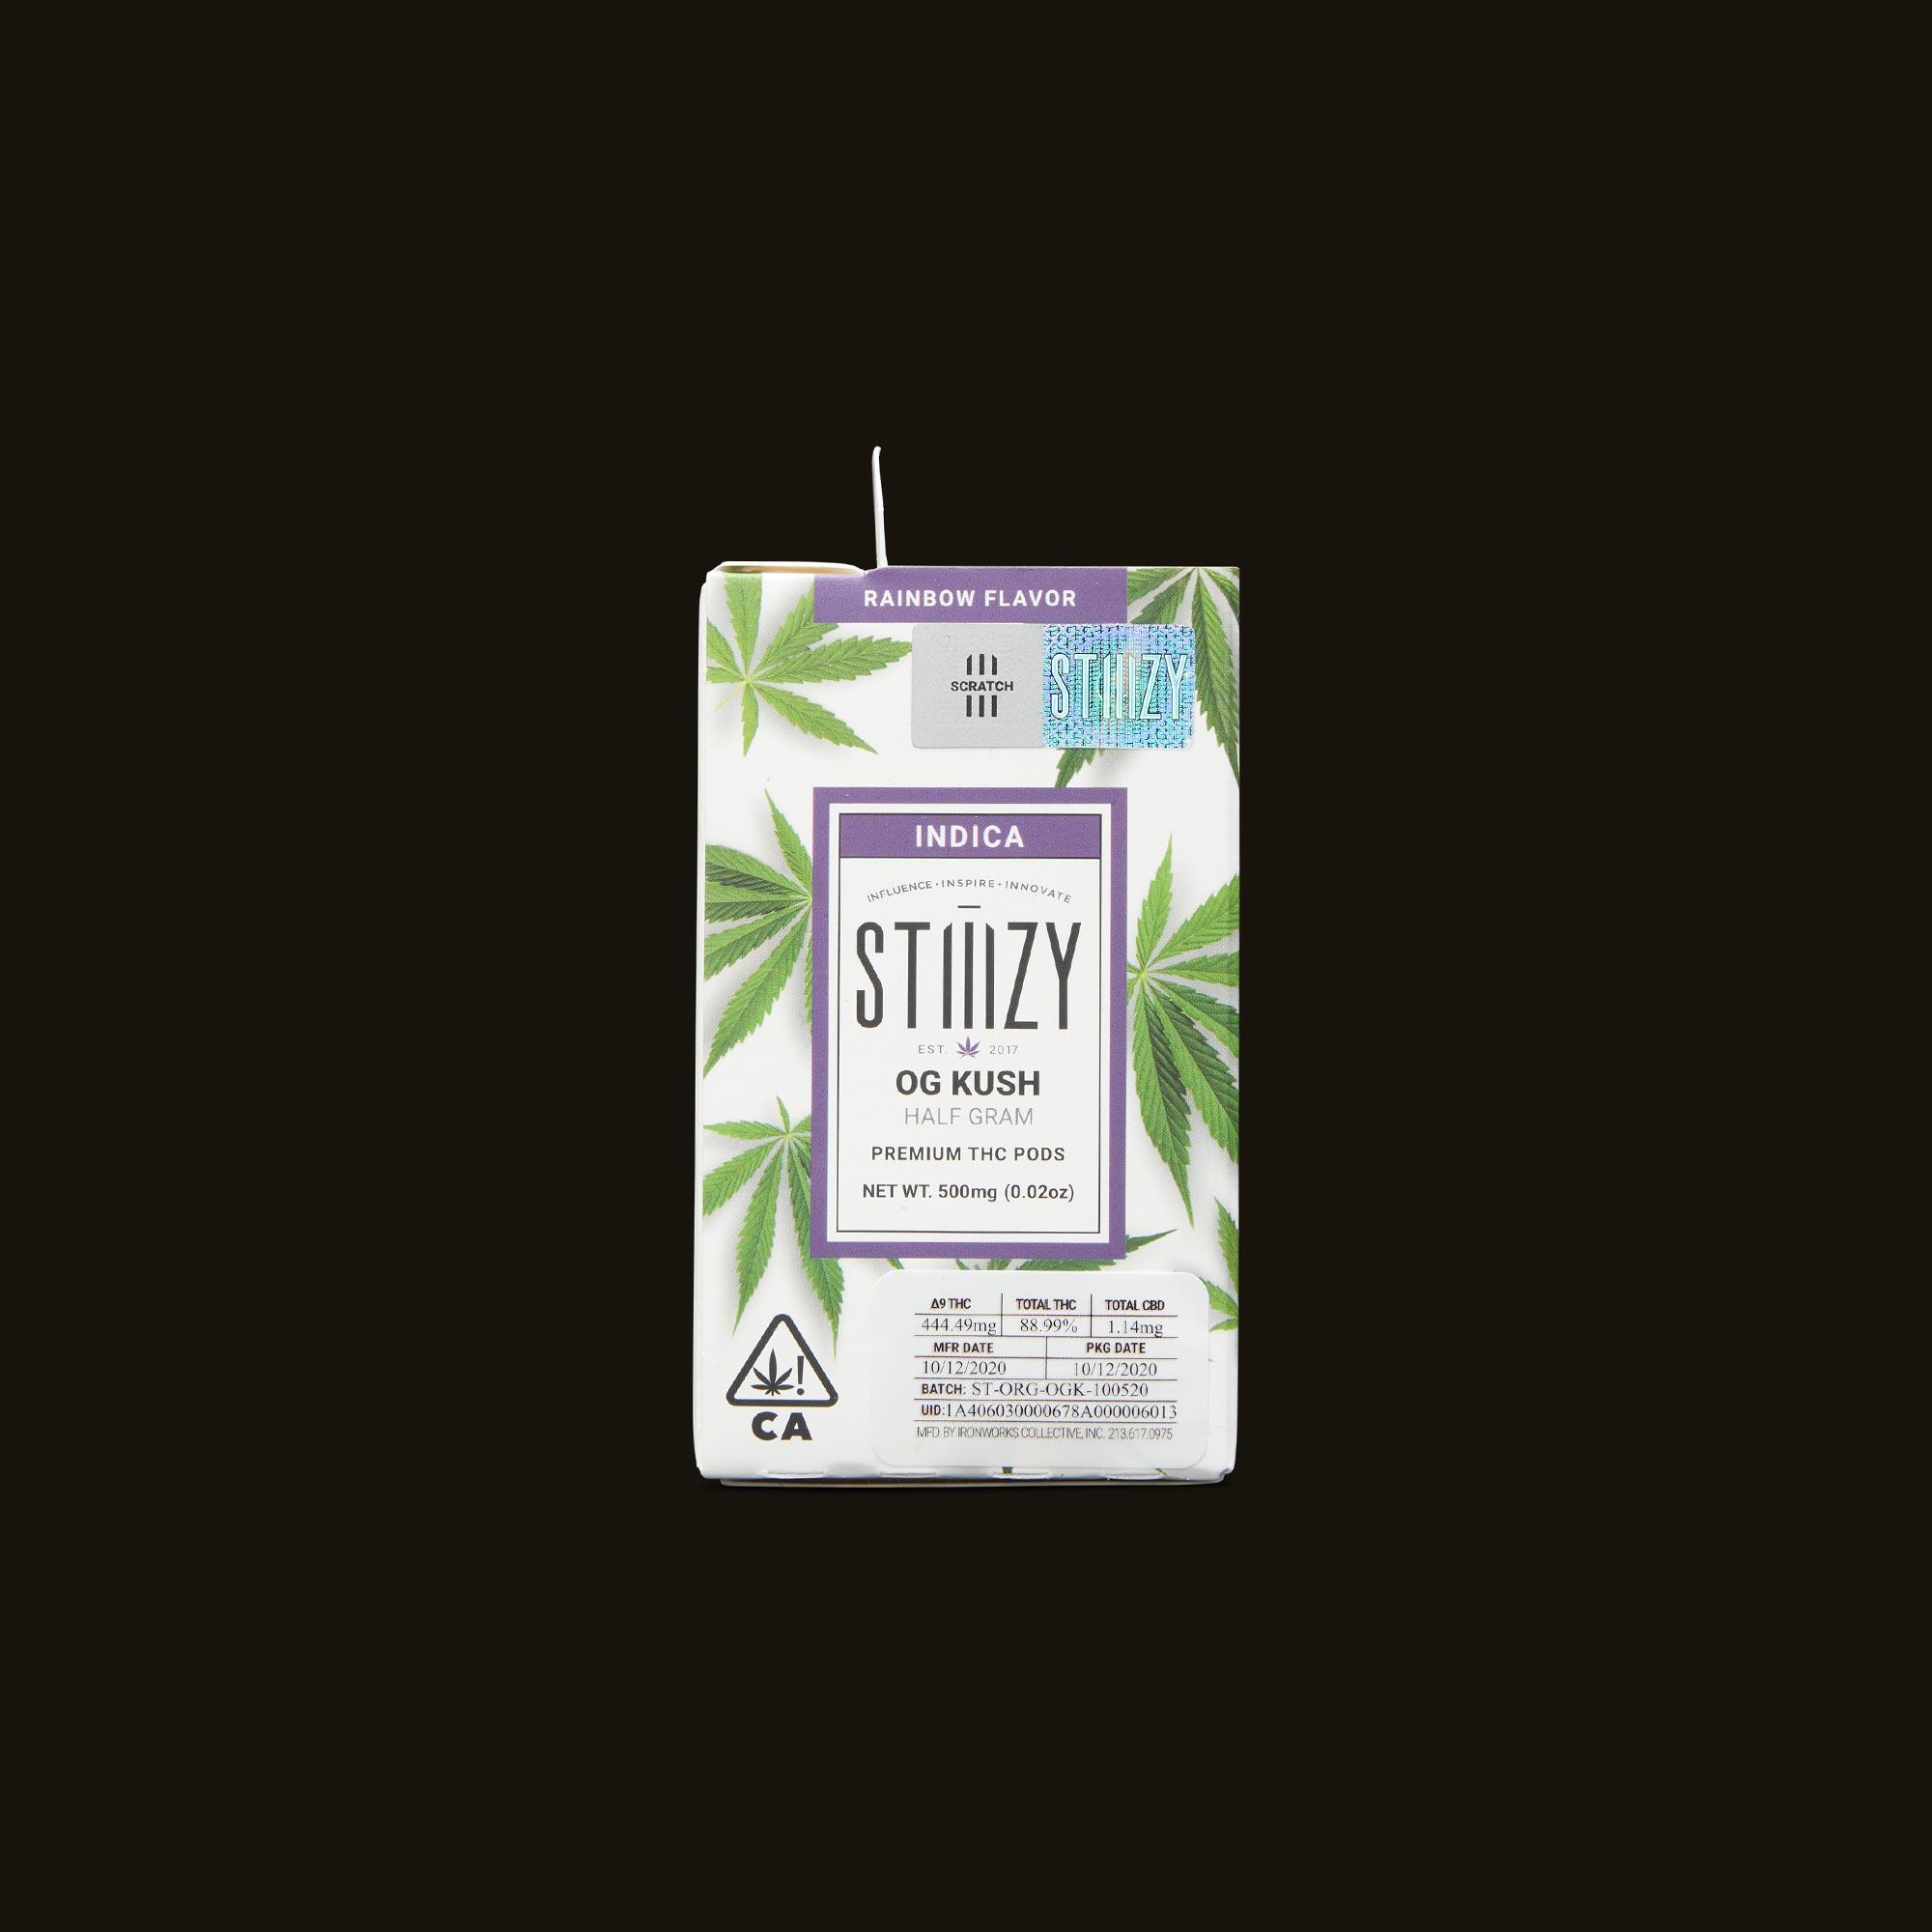 Stiiizy OG Kush Pod Front Packaging